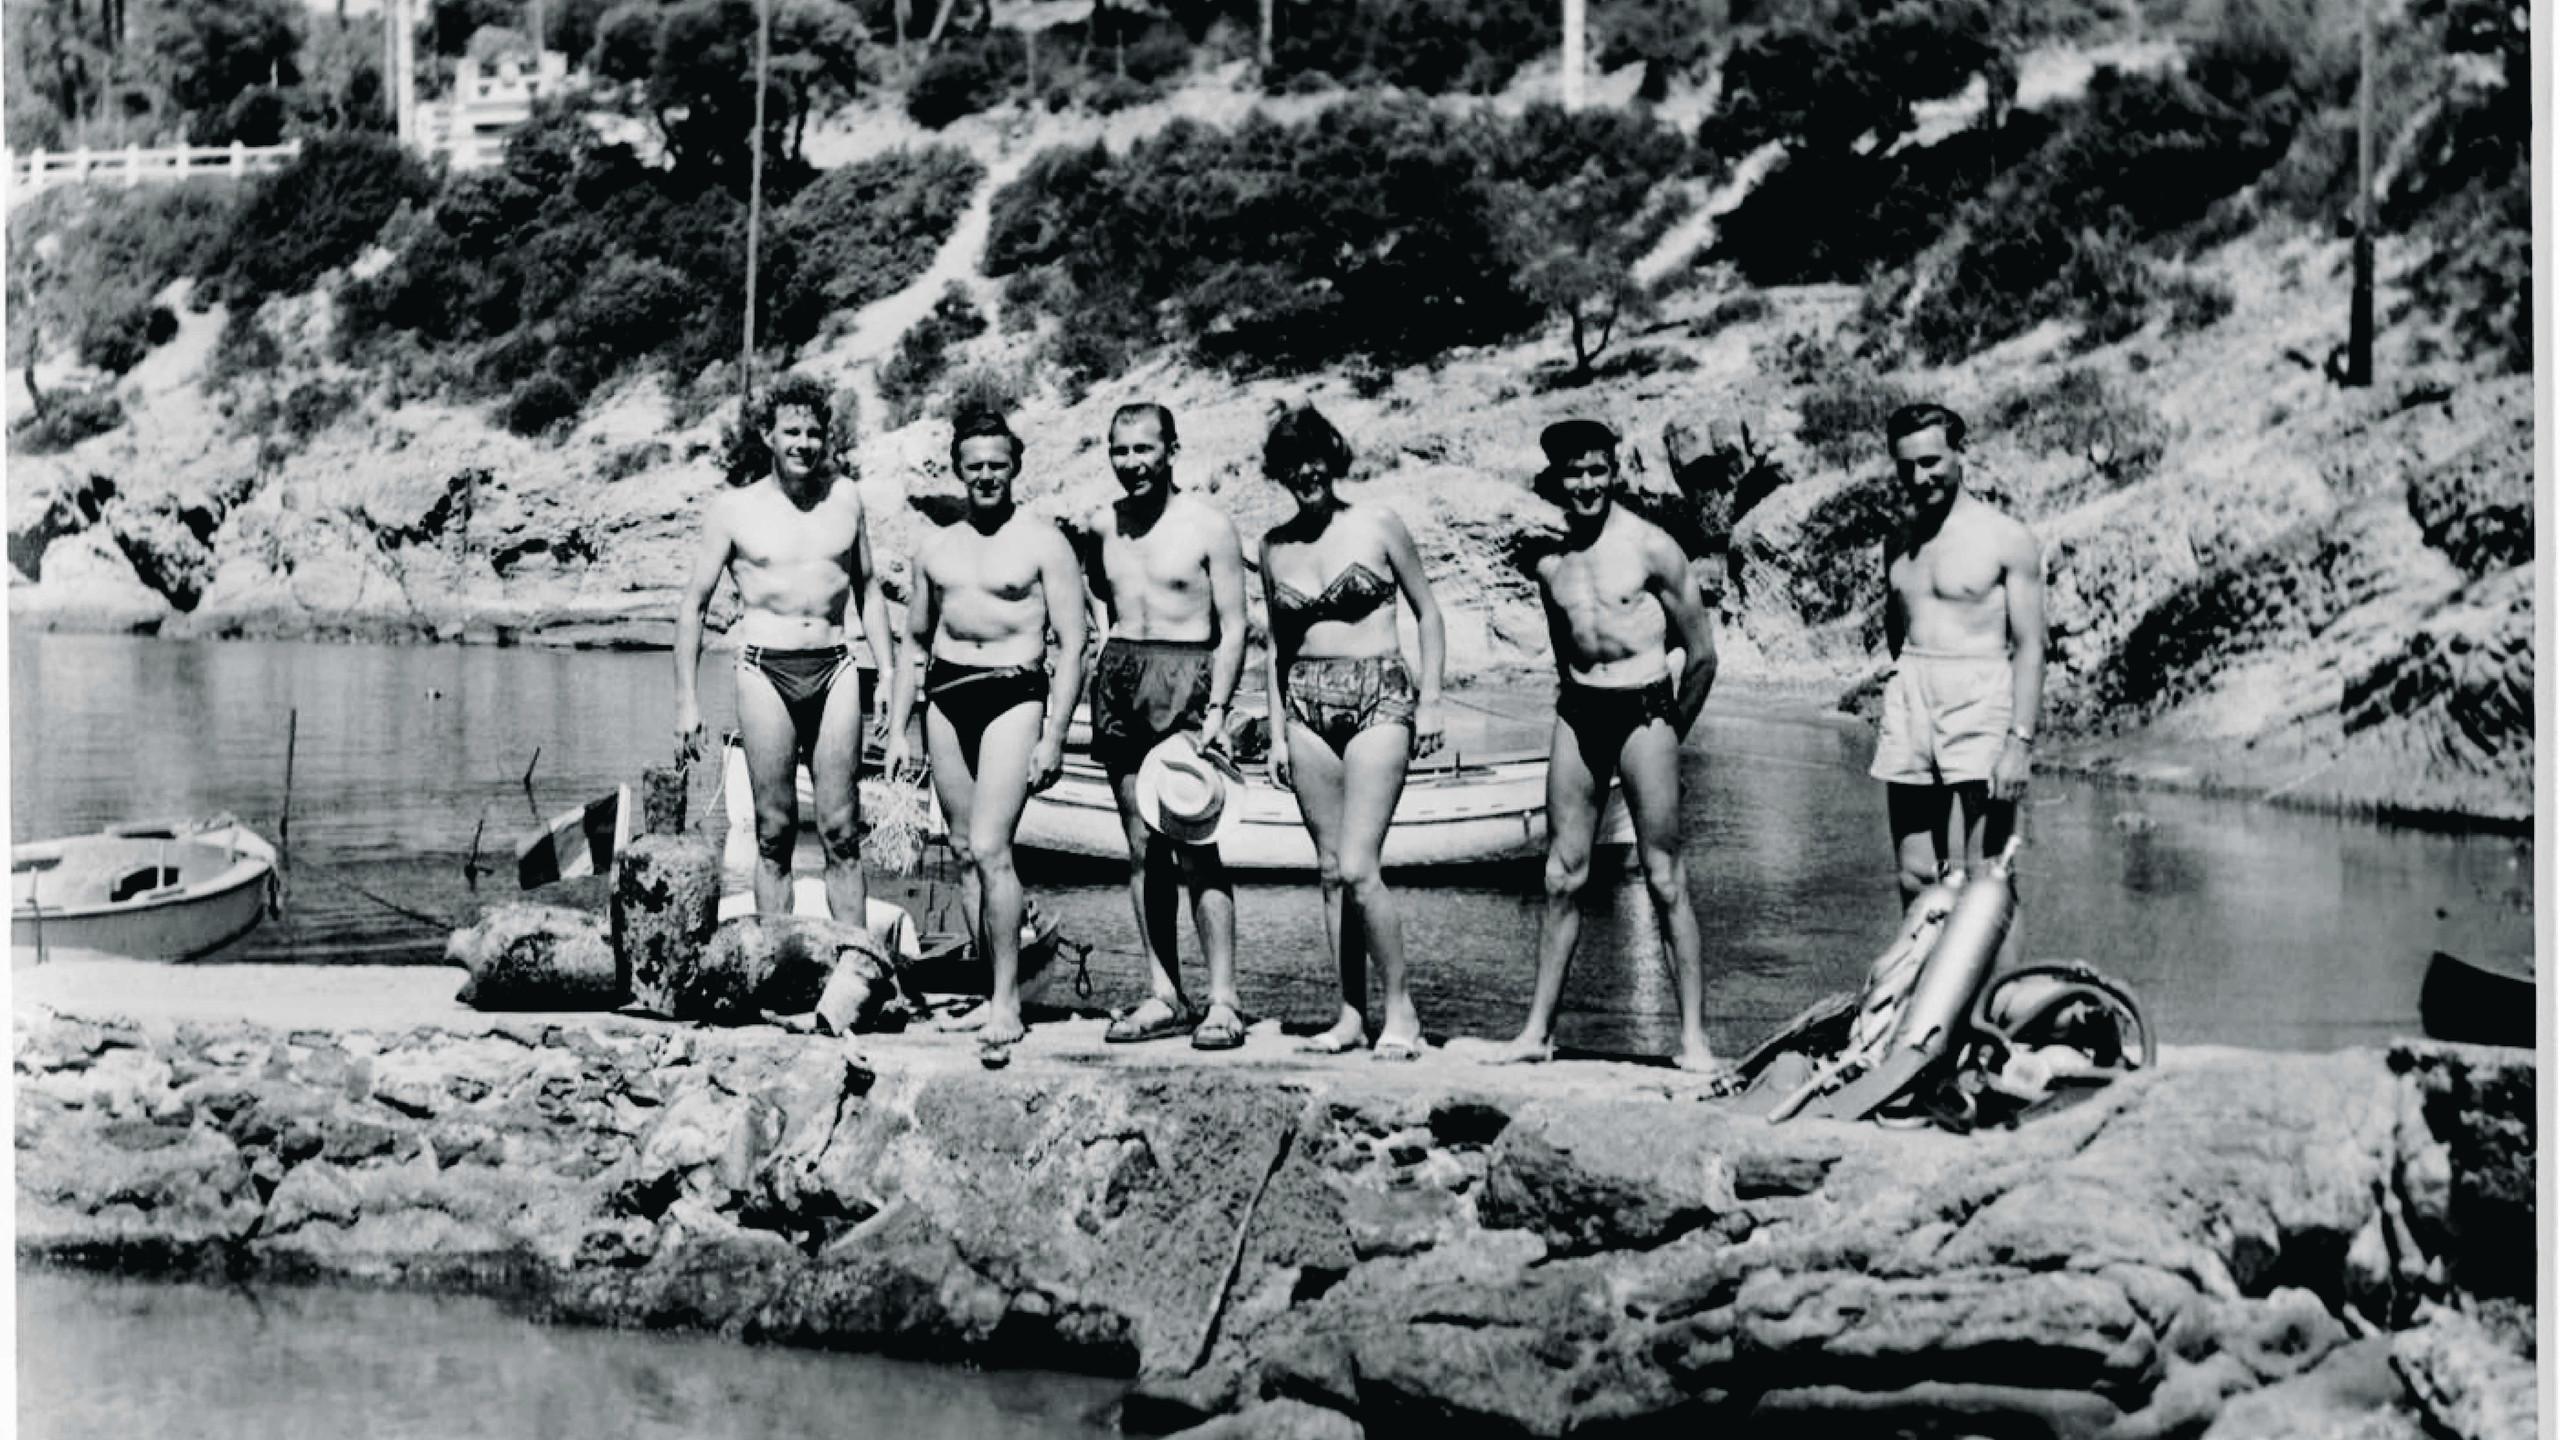 Jean-Jacques Fiechter 於是1953 年在法國南部Antibes 度假潛水時, 與他的指導員同樣佩戴五十噚潛水錶。